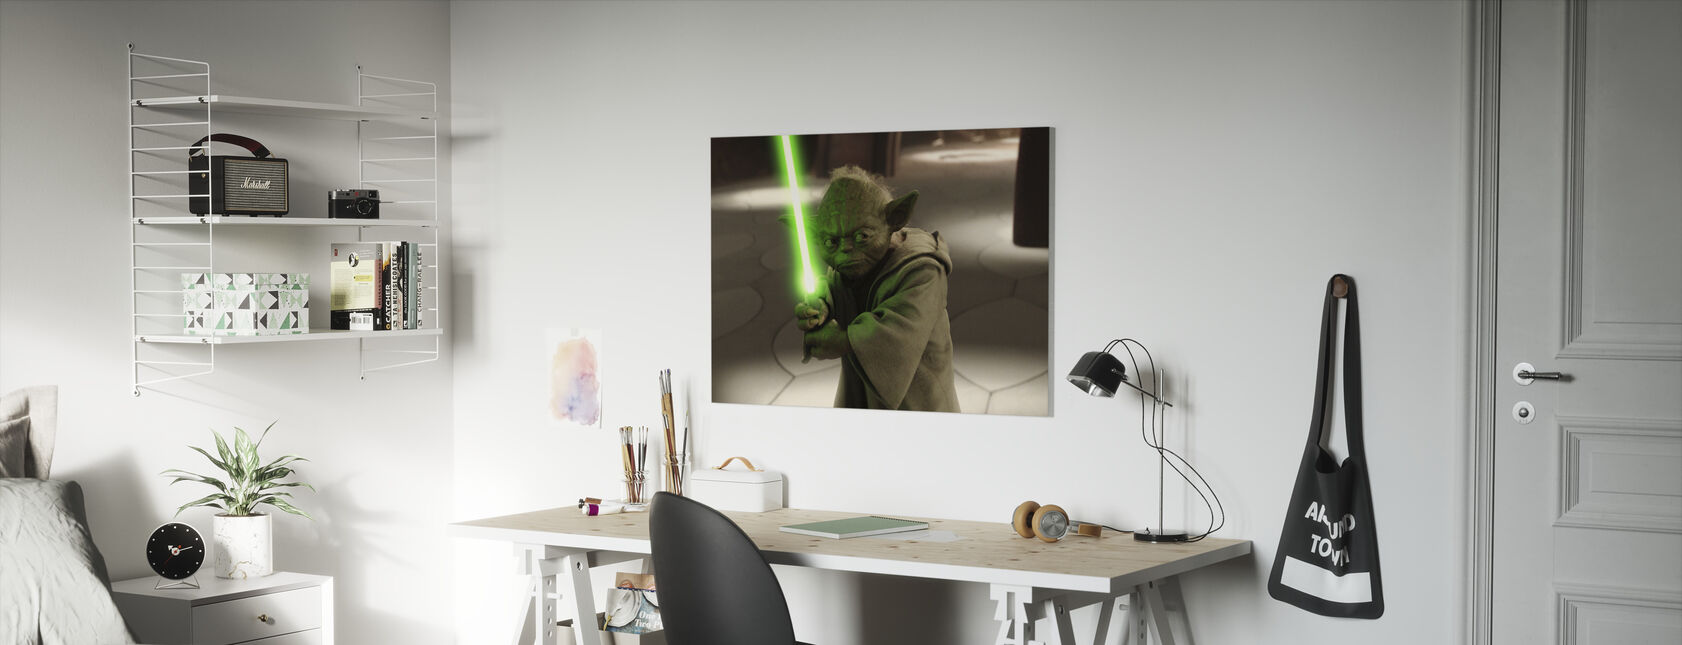 Star Wars - Yoda i Geonosis hemmelig hangar - Lerretsbilde - Barnerom